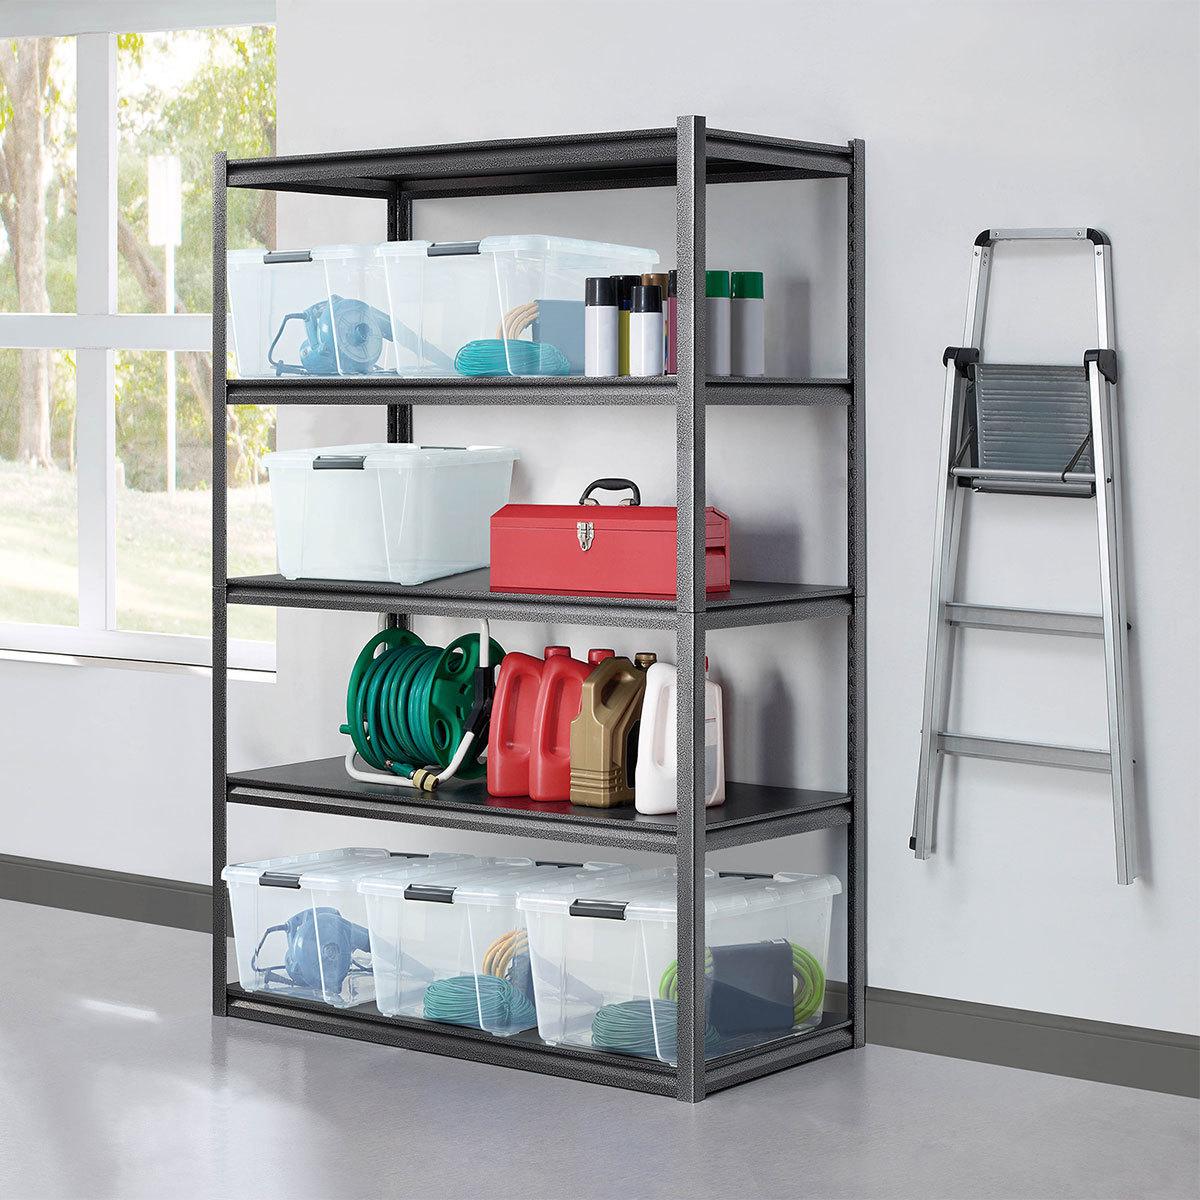 "Whalen 5 Tier 48"" (121cm) Step Beam Heavy Duty Storage Shelf Rack £53.98 instore @ Costco (Reading)"